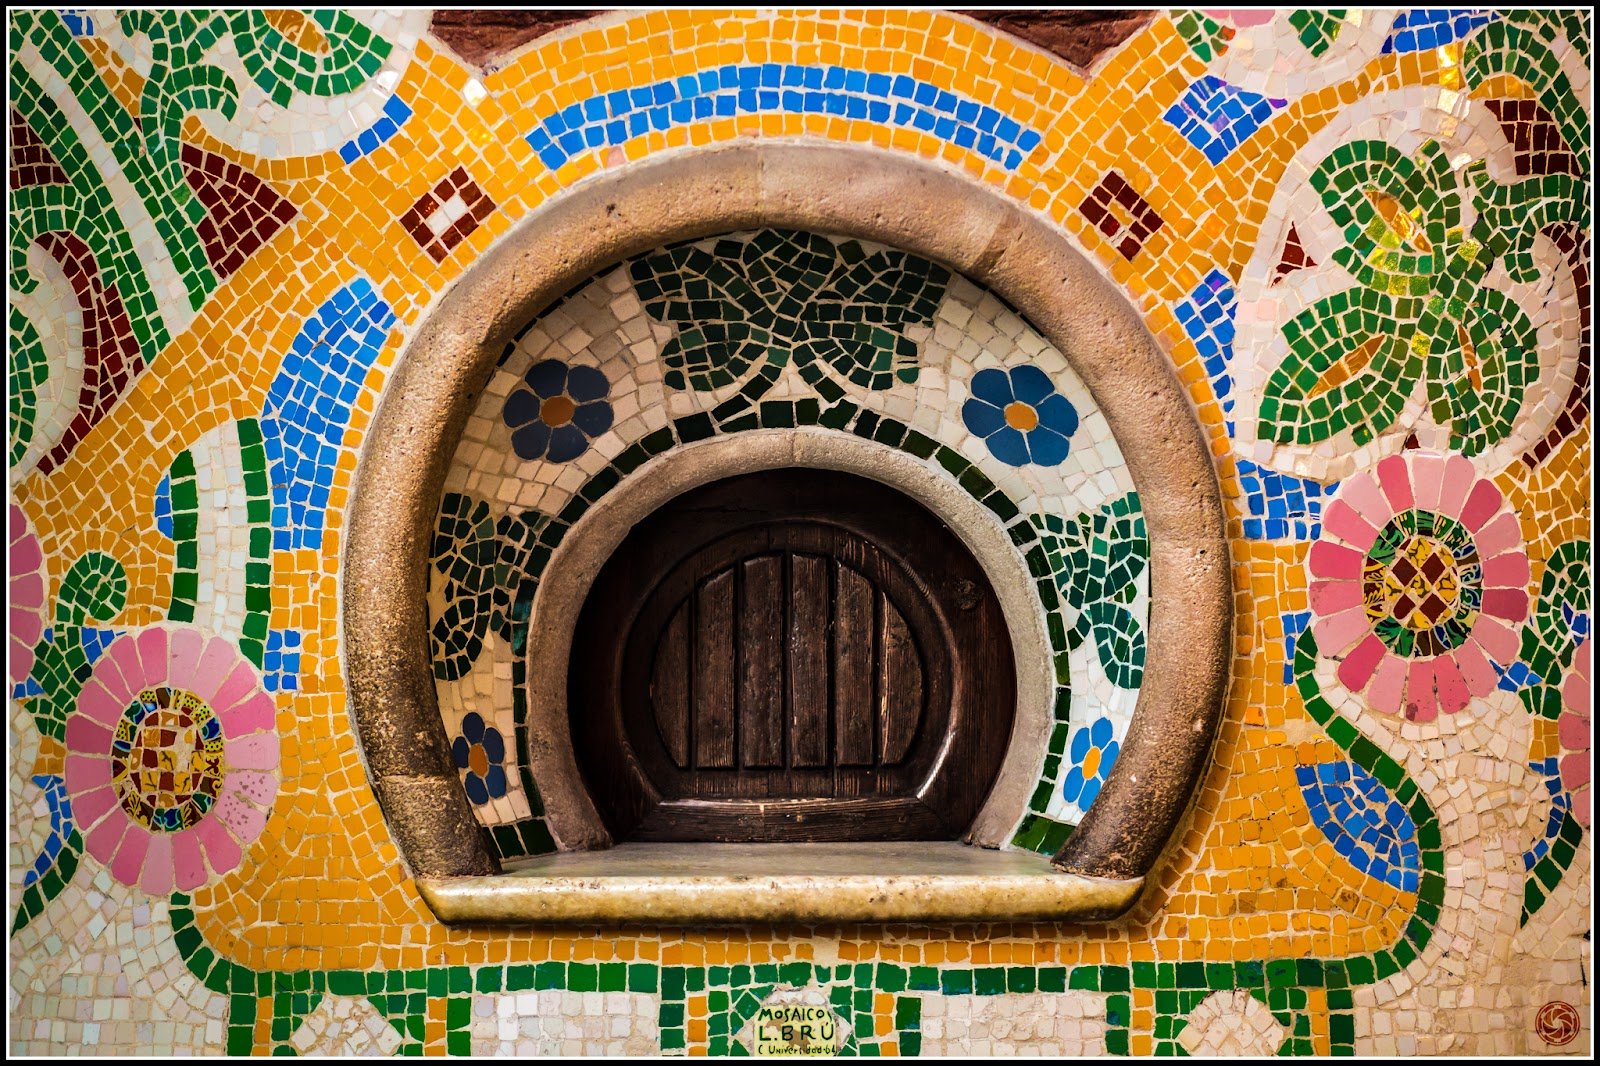 Palau de la Música Catalana :: Canon EOS 5D MkIII | ISO3200 | Canon 85mm | f/3.2 | 1/60s